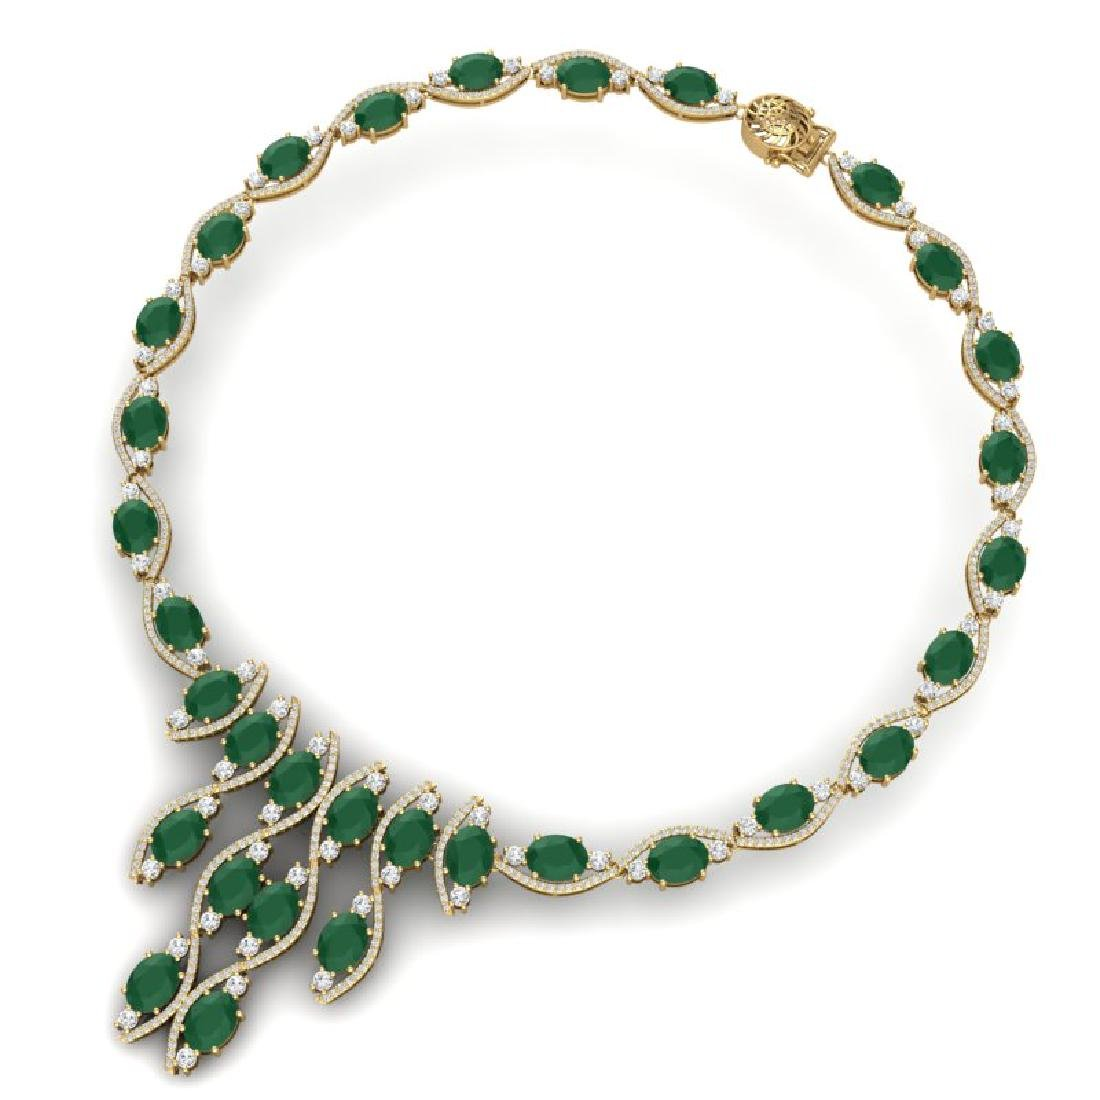 65.93 CTW Royalty Emerald & VS Diamond Necklace 18K - 2